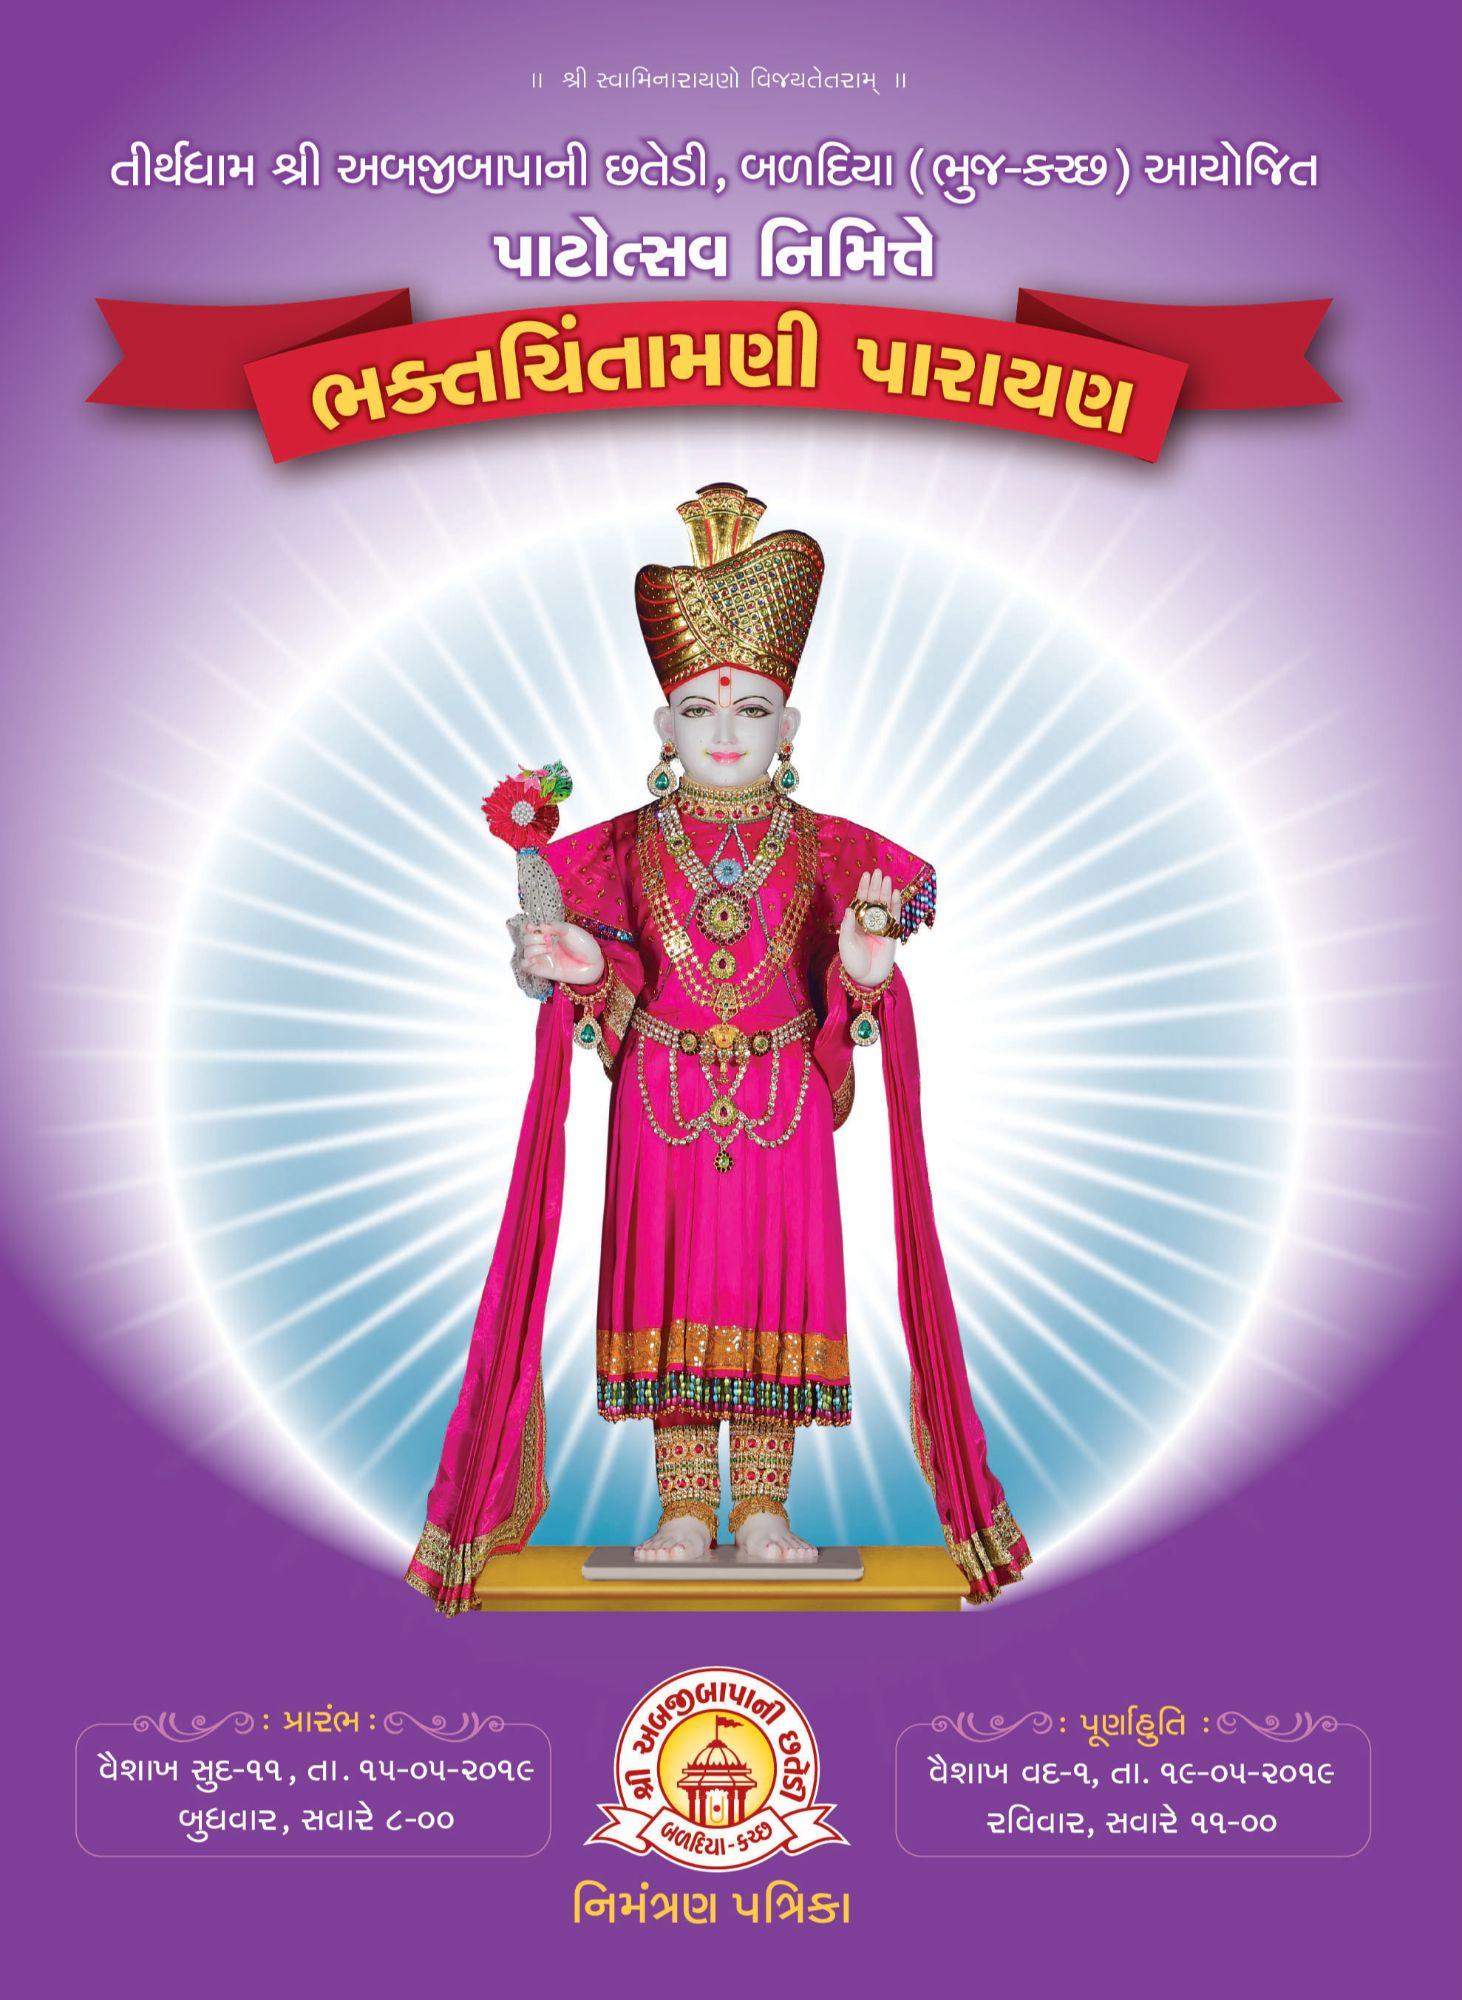 Patotsav nimite BhaktChintamani Parayan Dt 15 to 19/05/2019